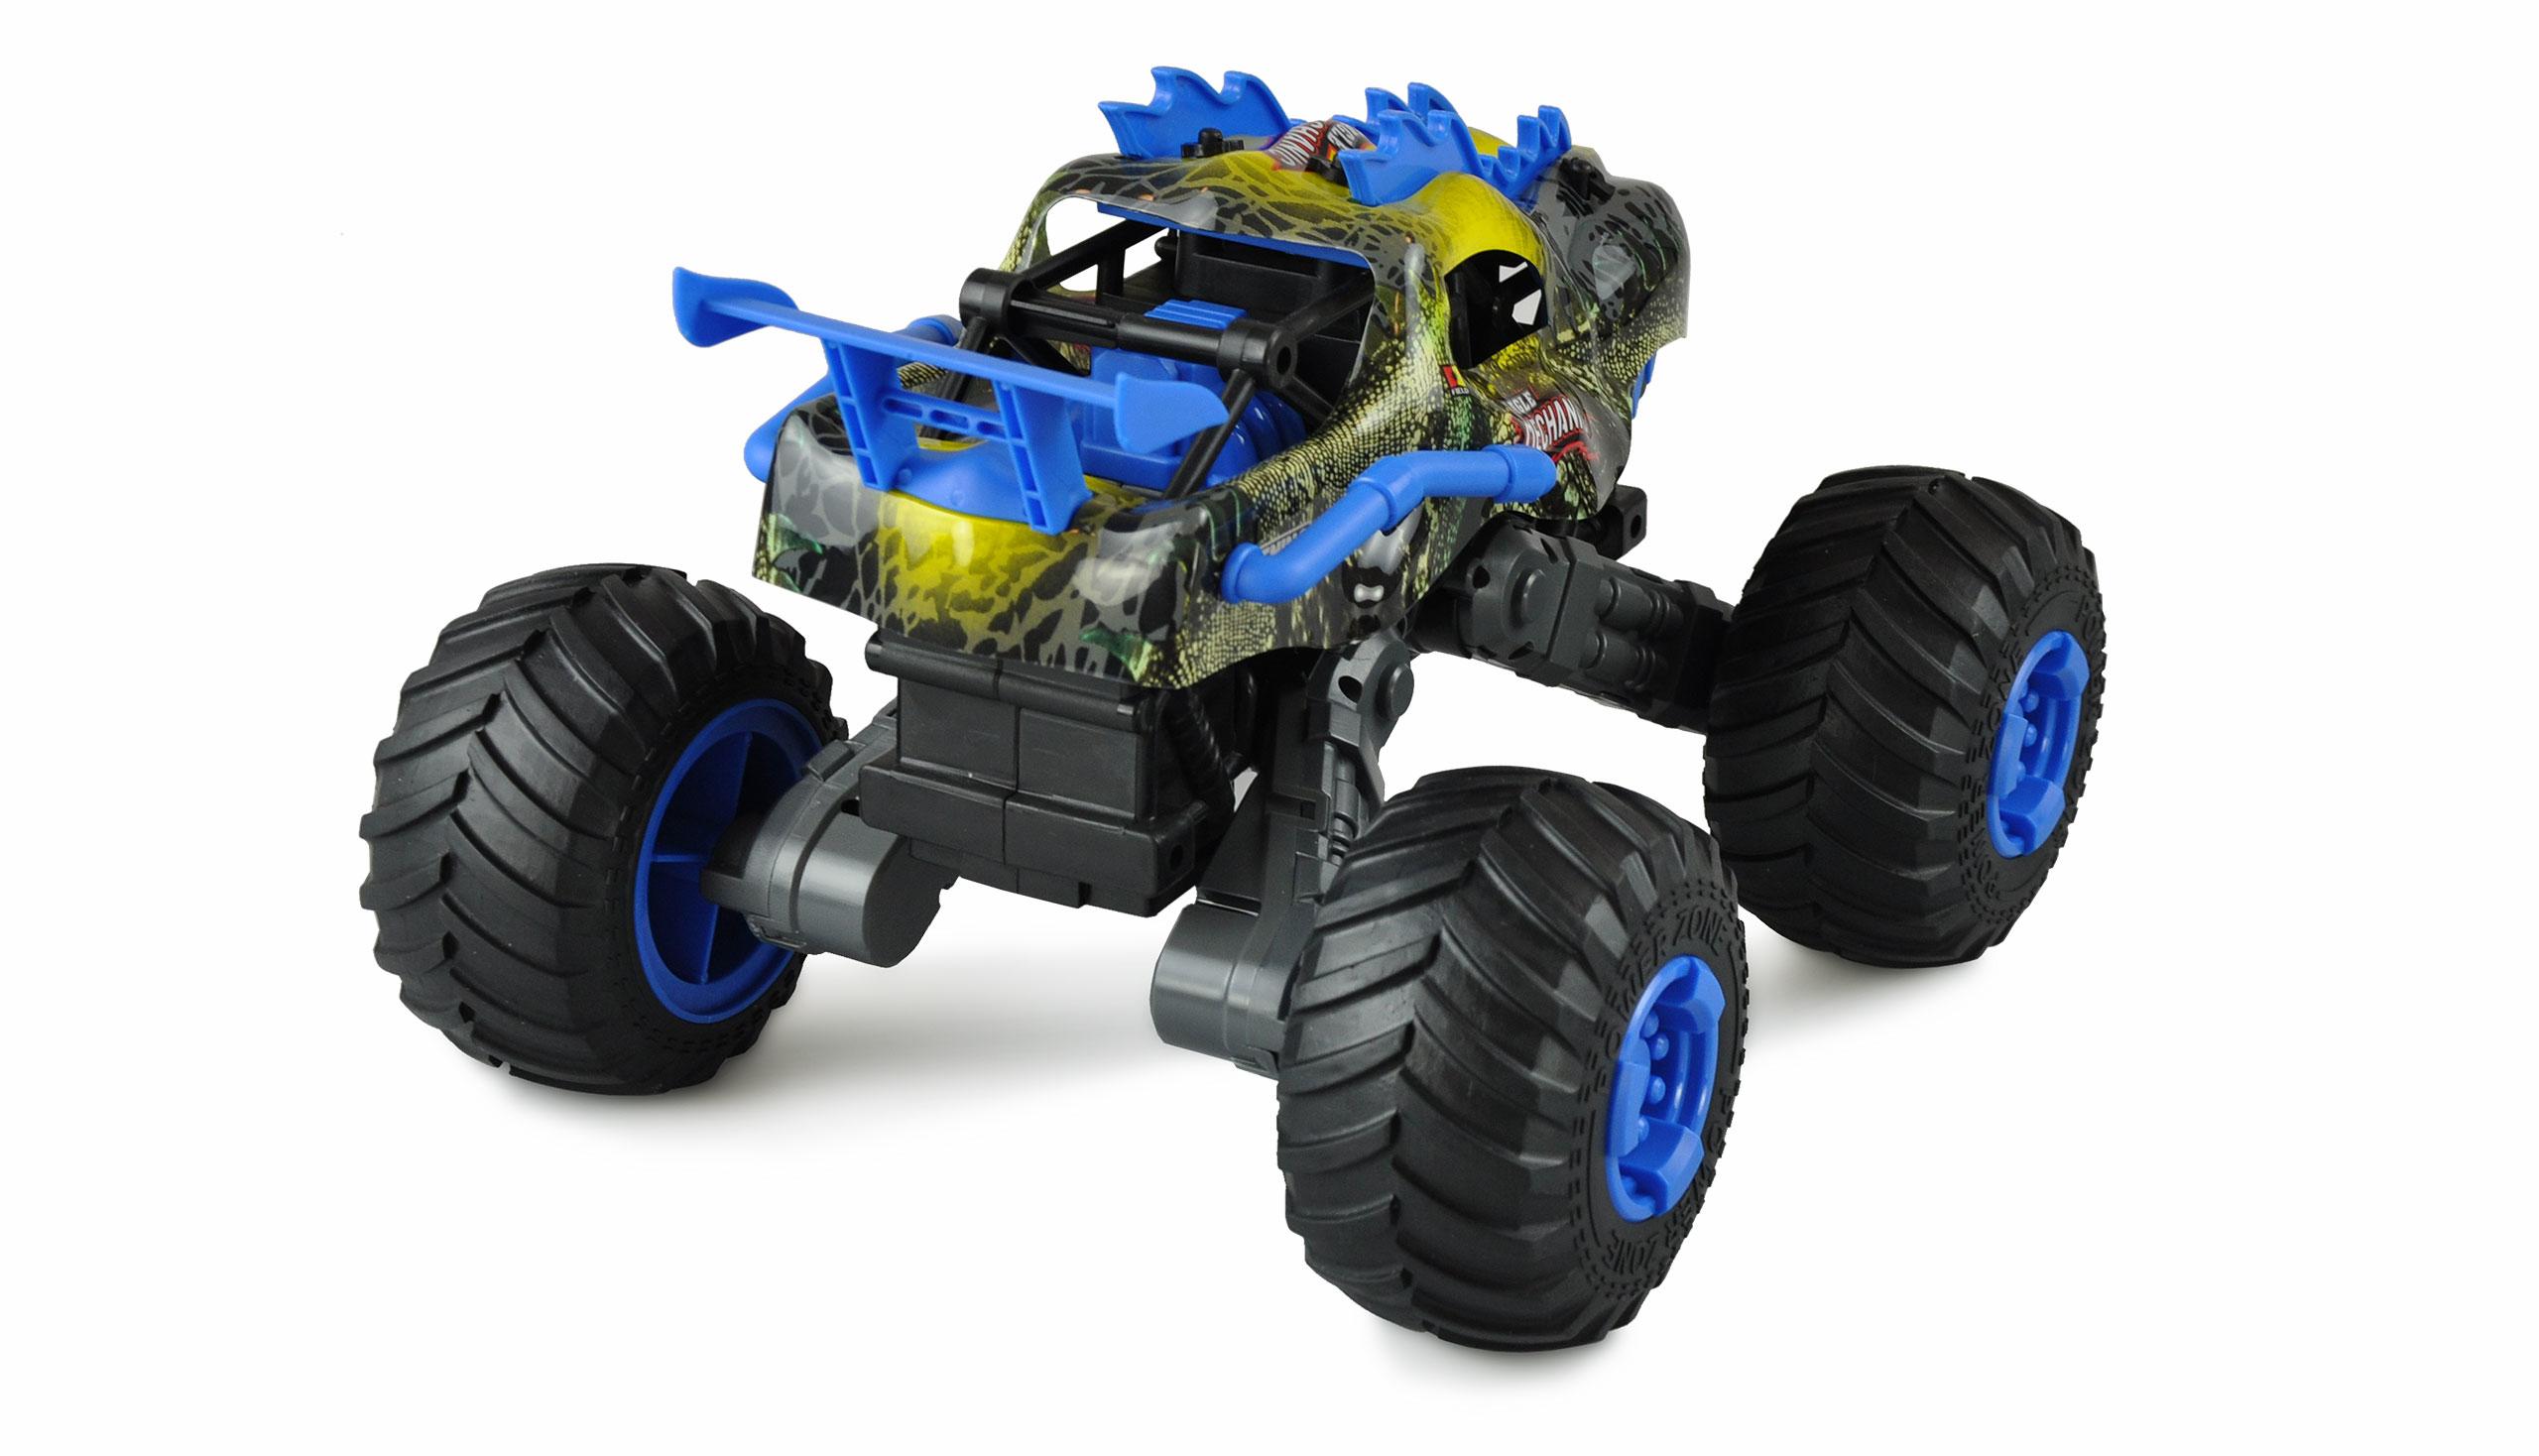 Amewi Mechanic Dinosaur - Monstertruck - 1:16 - Junge - 6 Jahr(e) - 1200 mAh - 1,14 kg